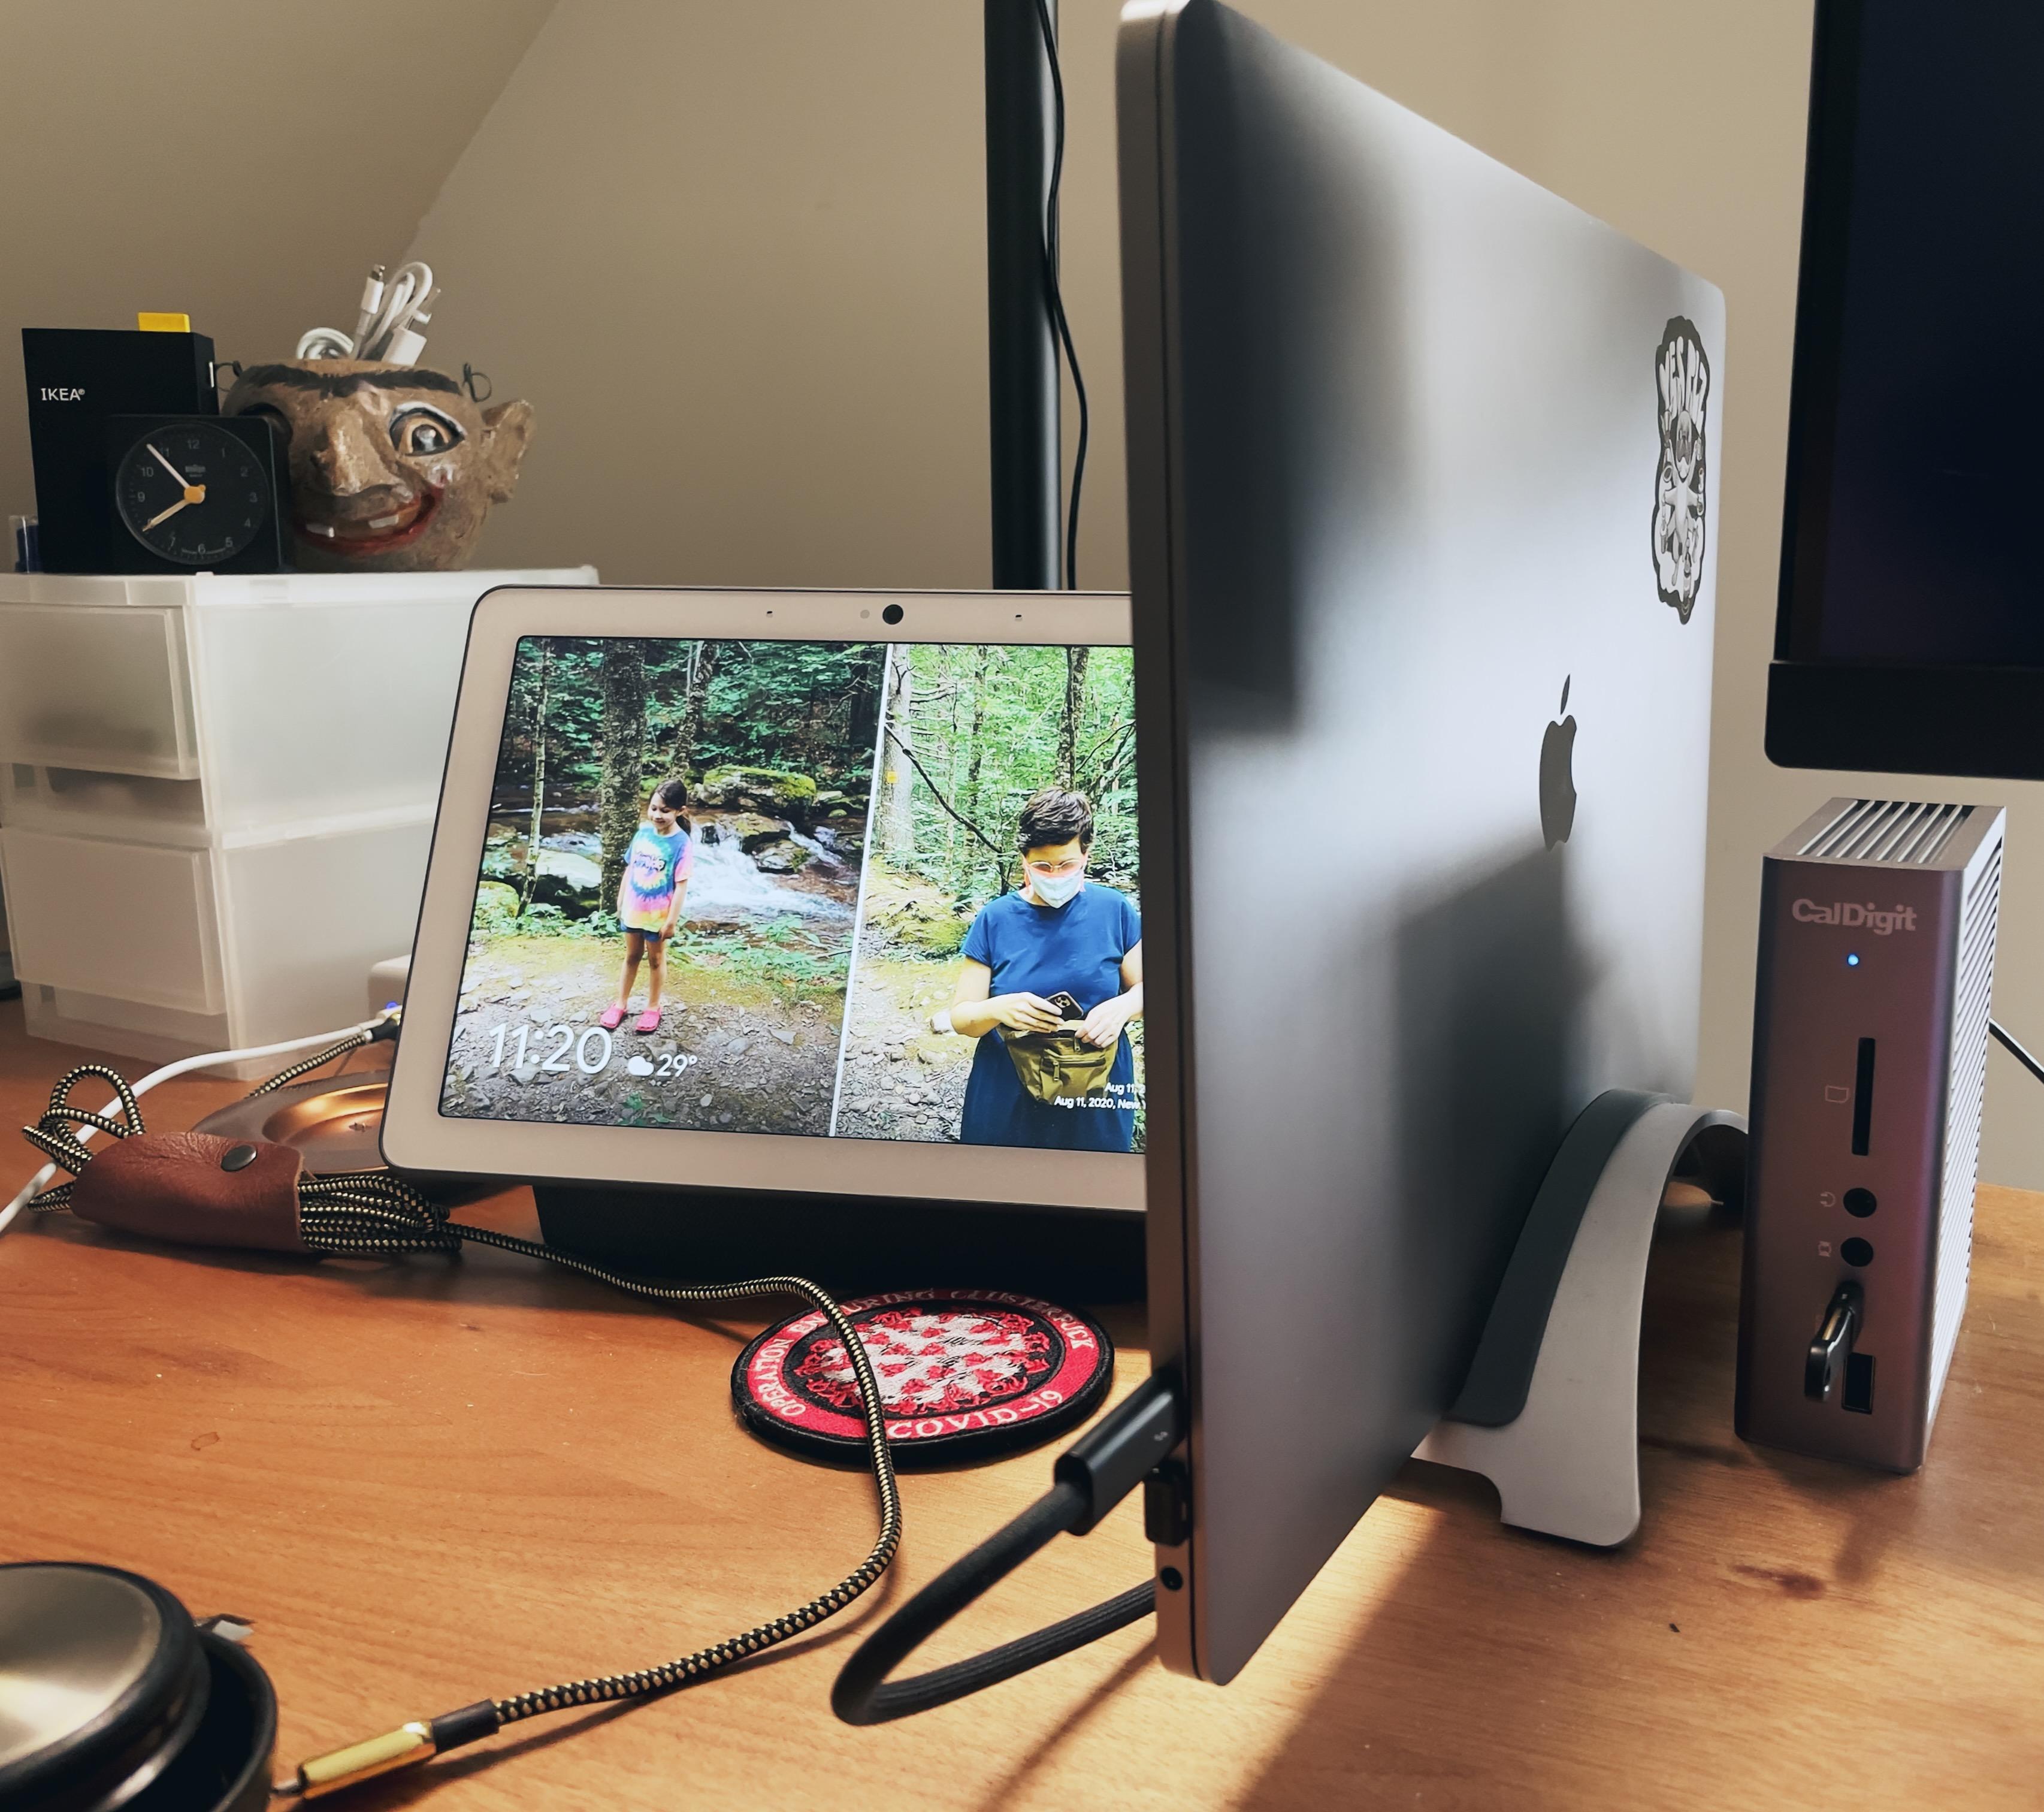 My MacBook Pro docked on my desk